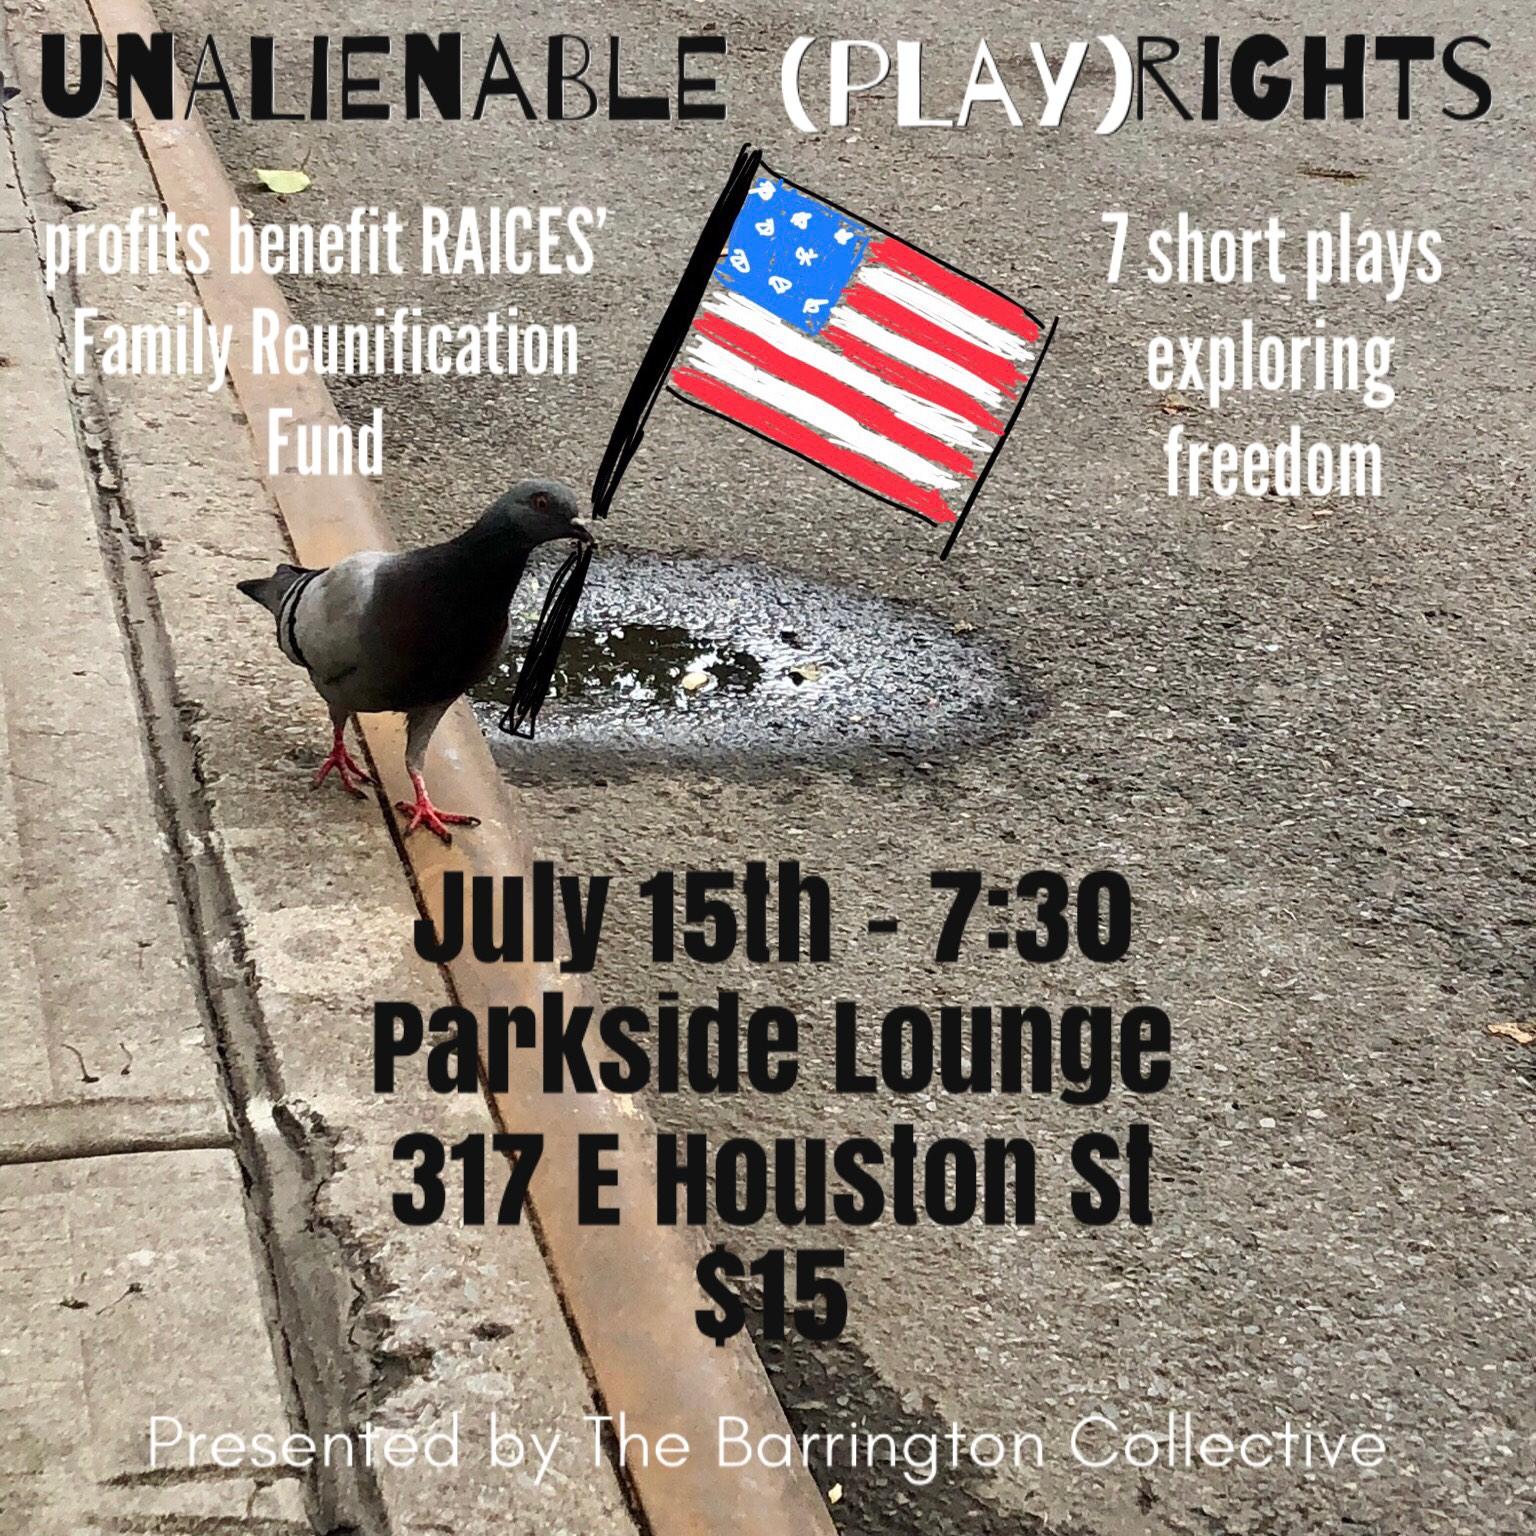 (play)rights.JPG